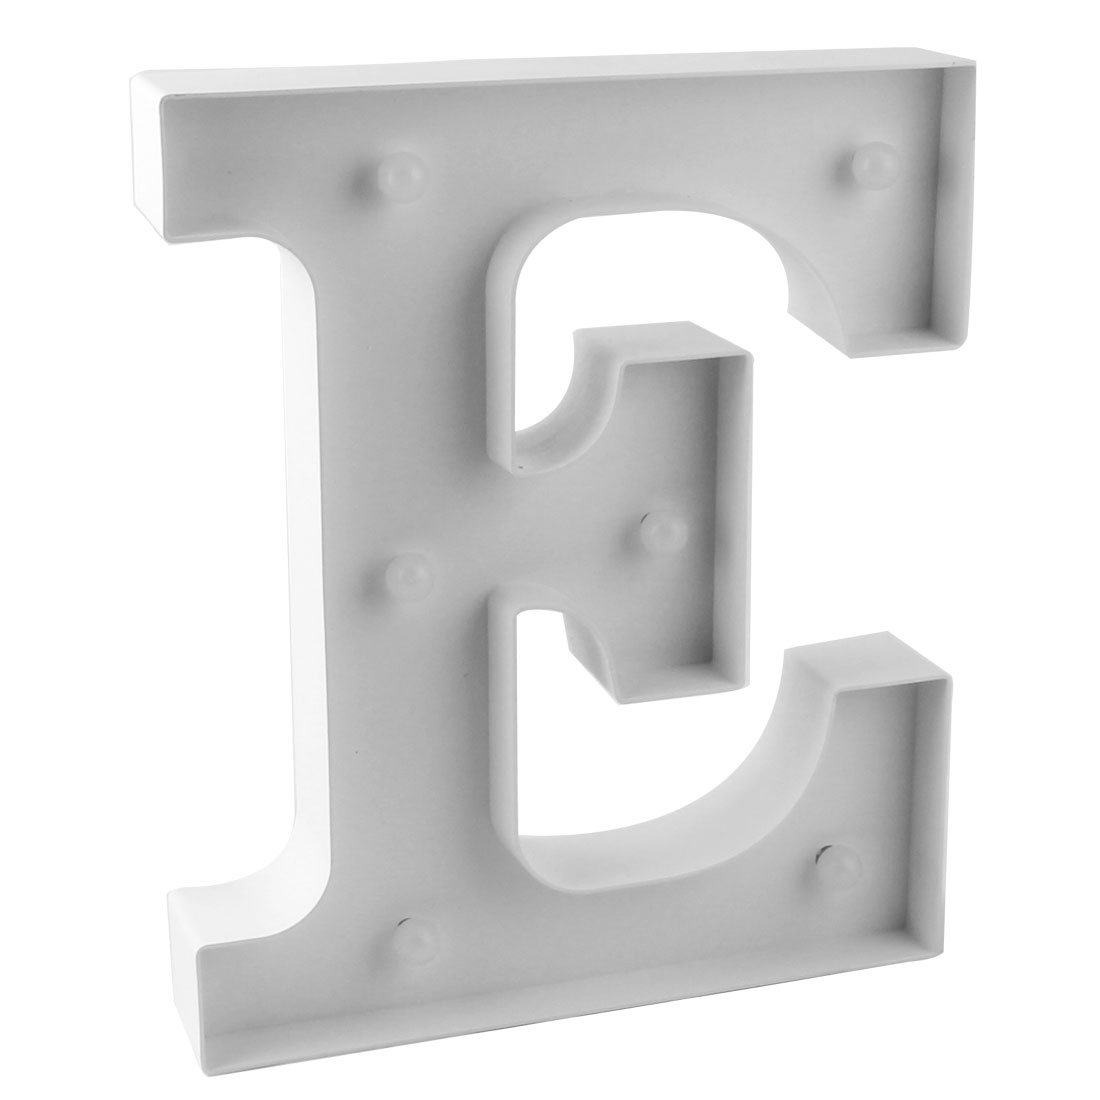 Wedding Party Plastic Decor English E Letter Alphabet Word Free DIY Hanging LED Light White